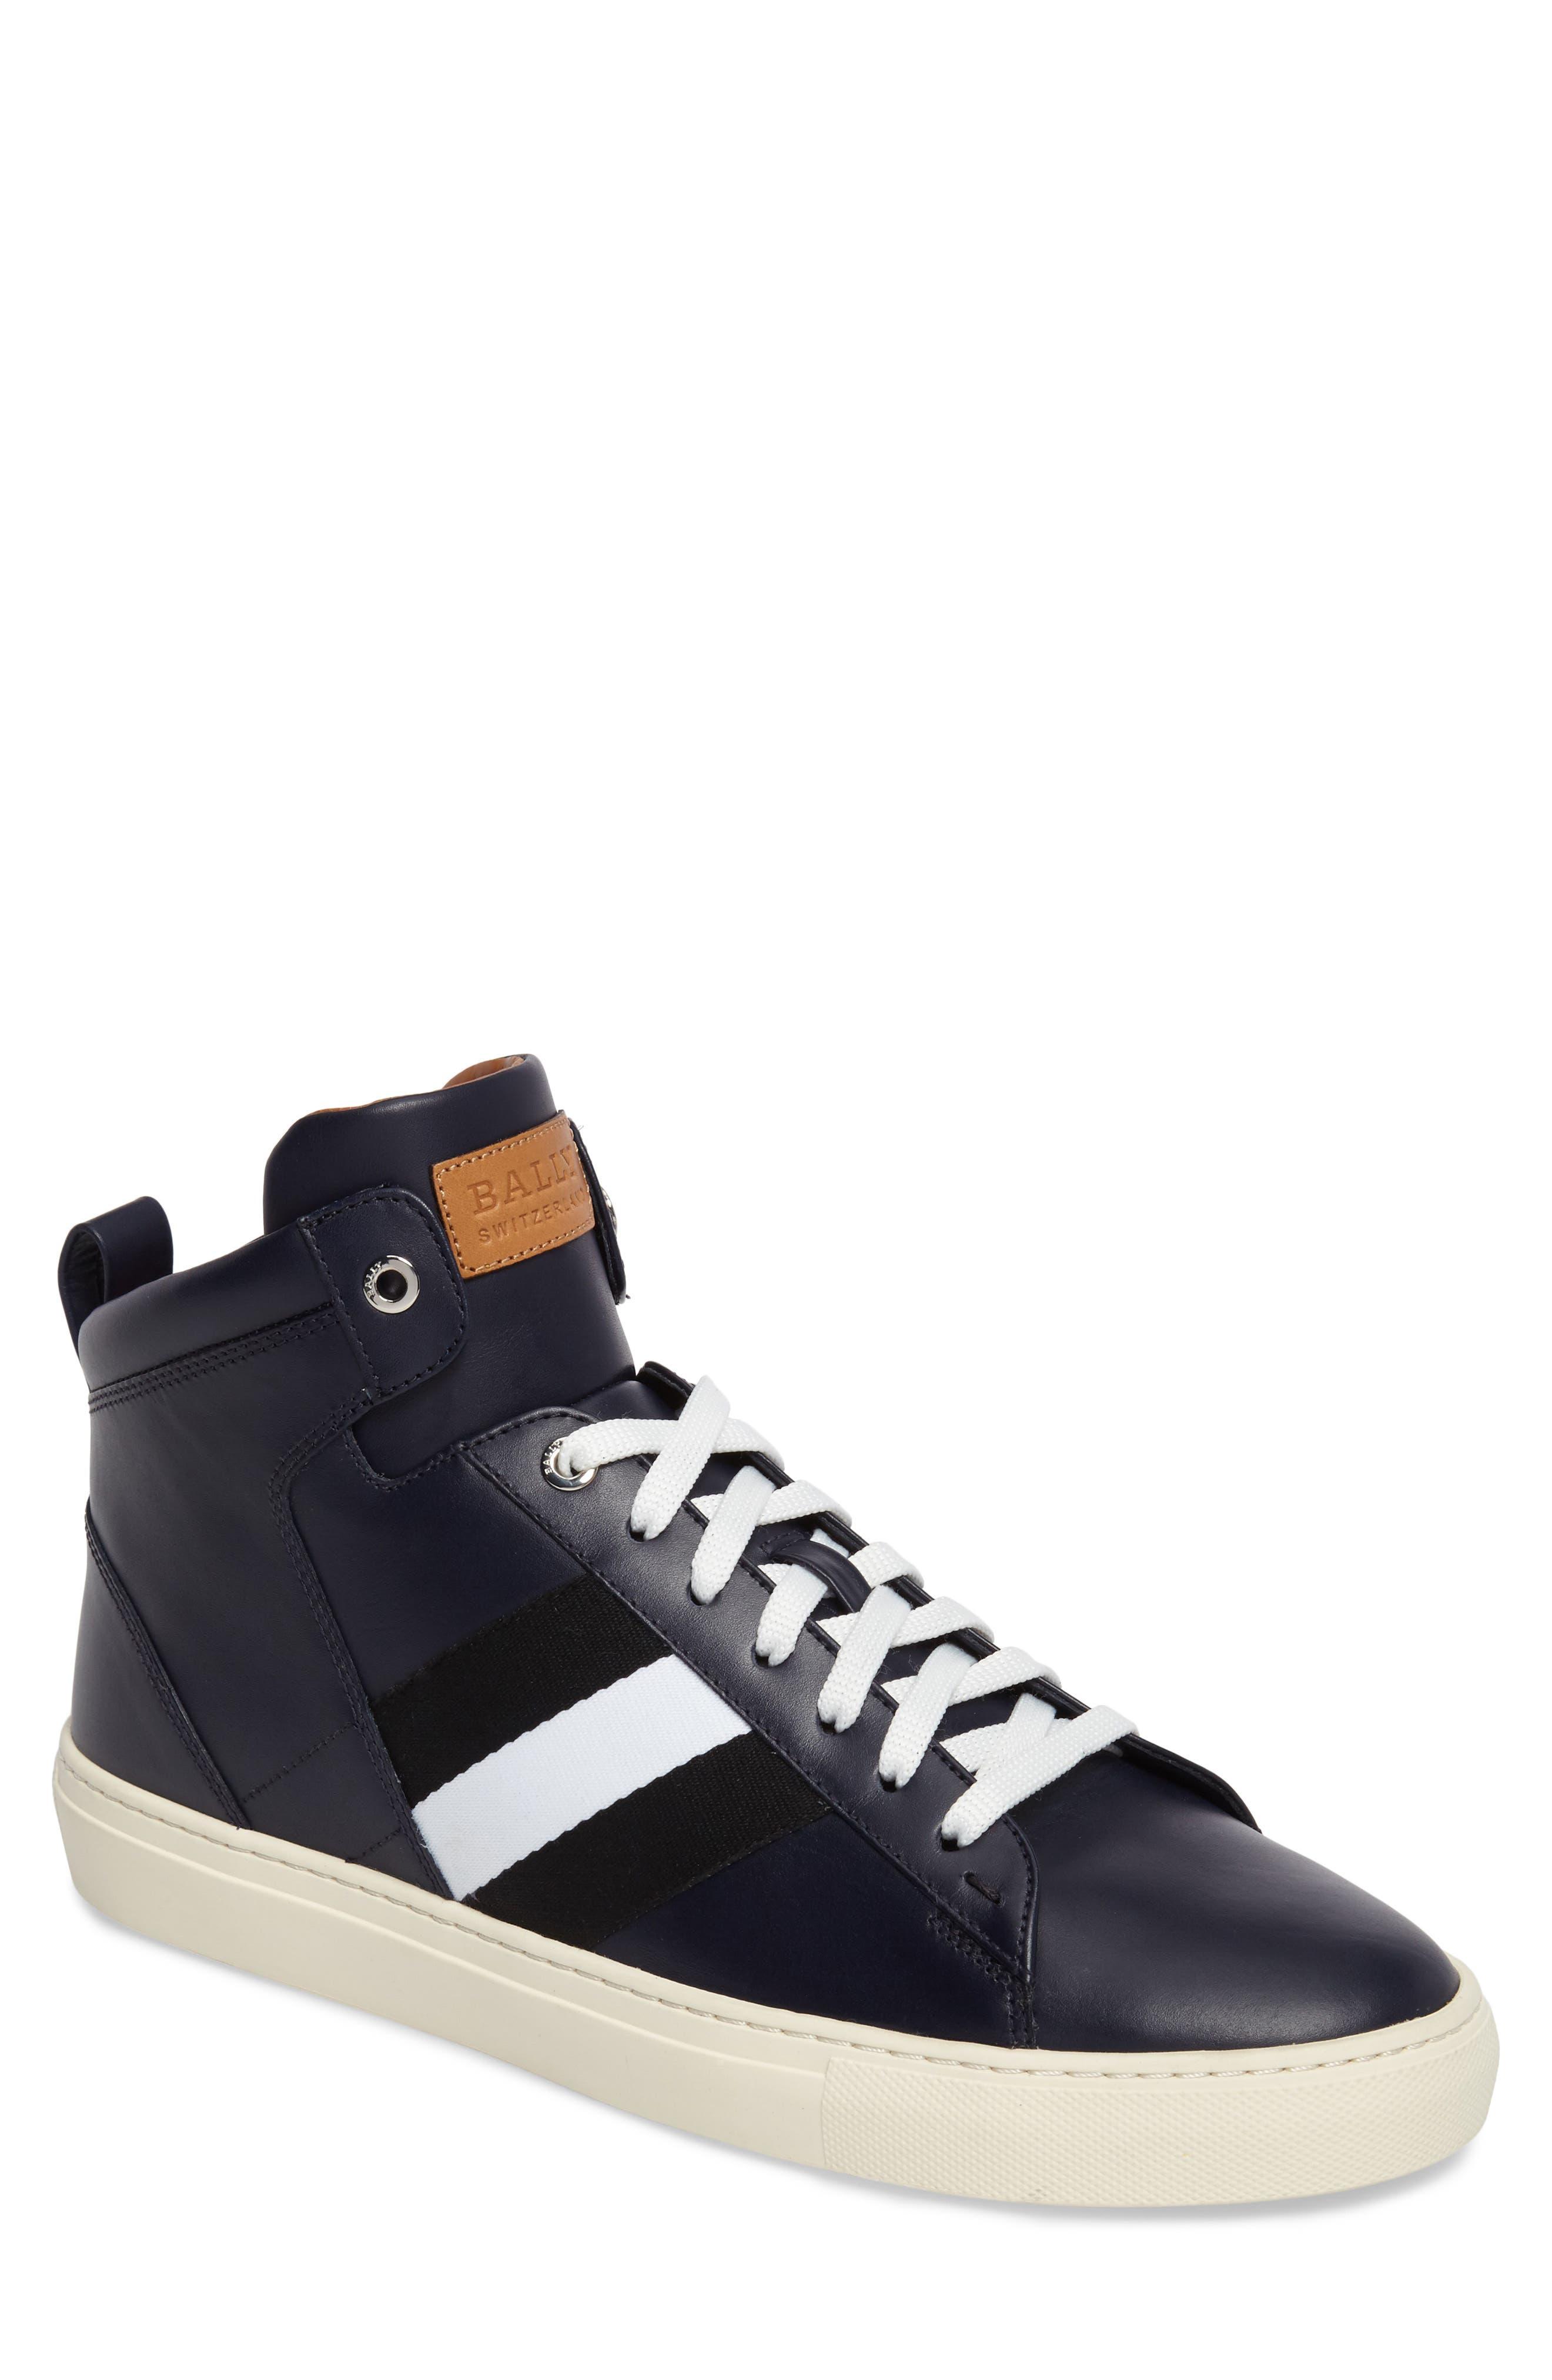 Main Image - Bally Hedern Sneaker (Men)